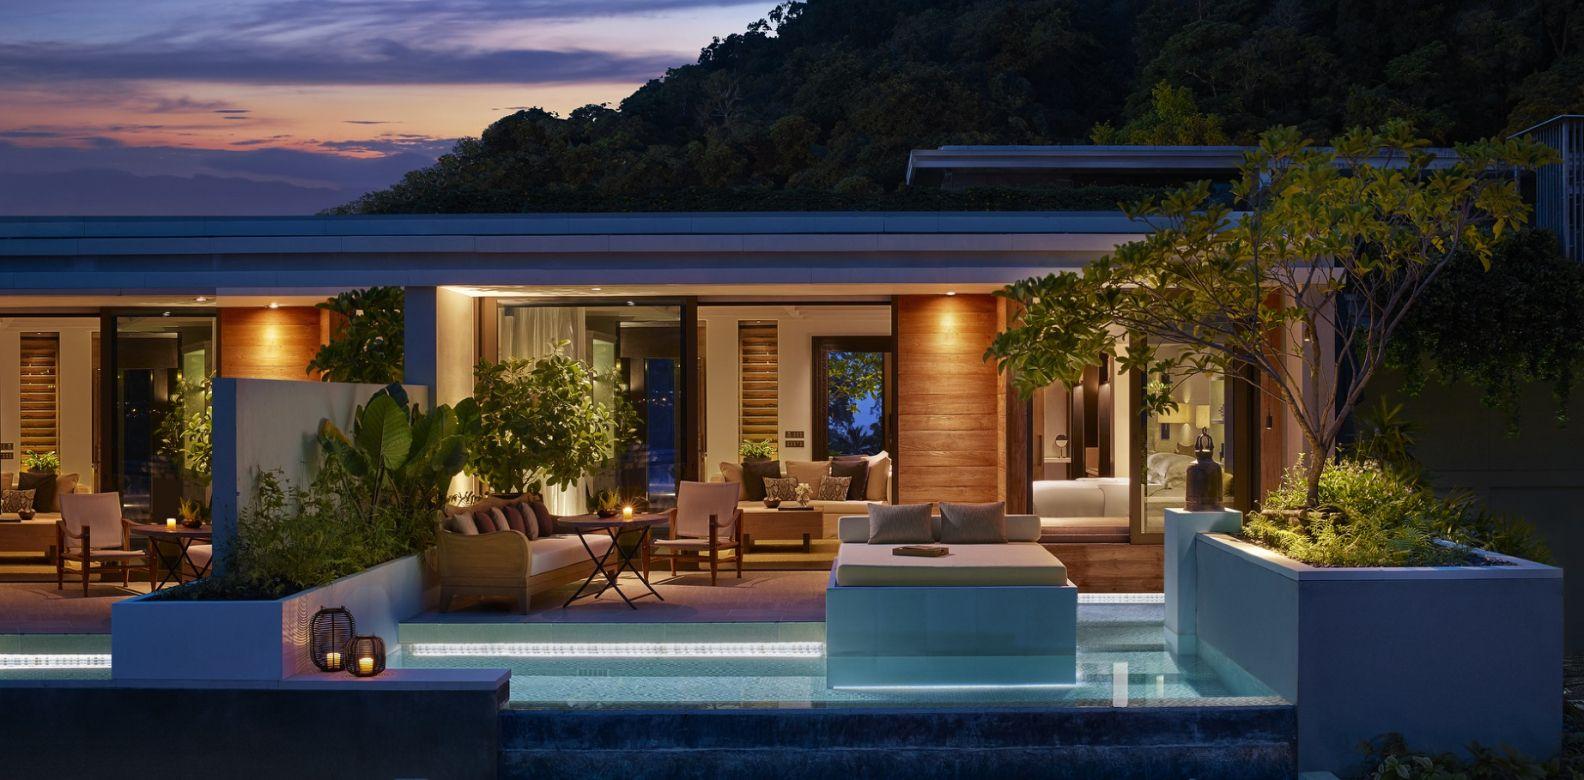 Rosewood Phuket Ocean Pool Pavilion By Night